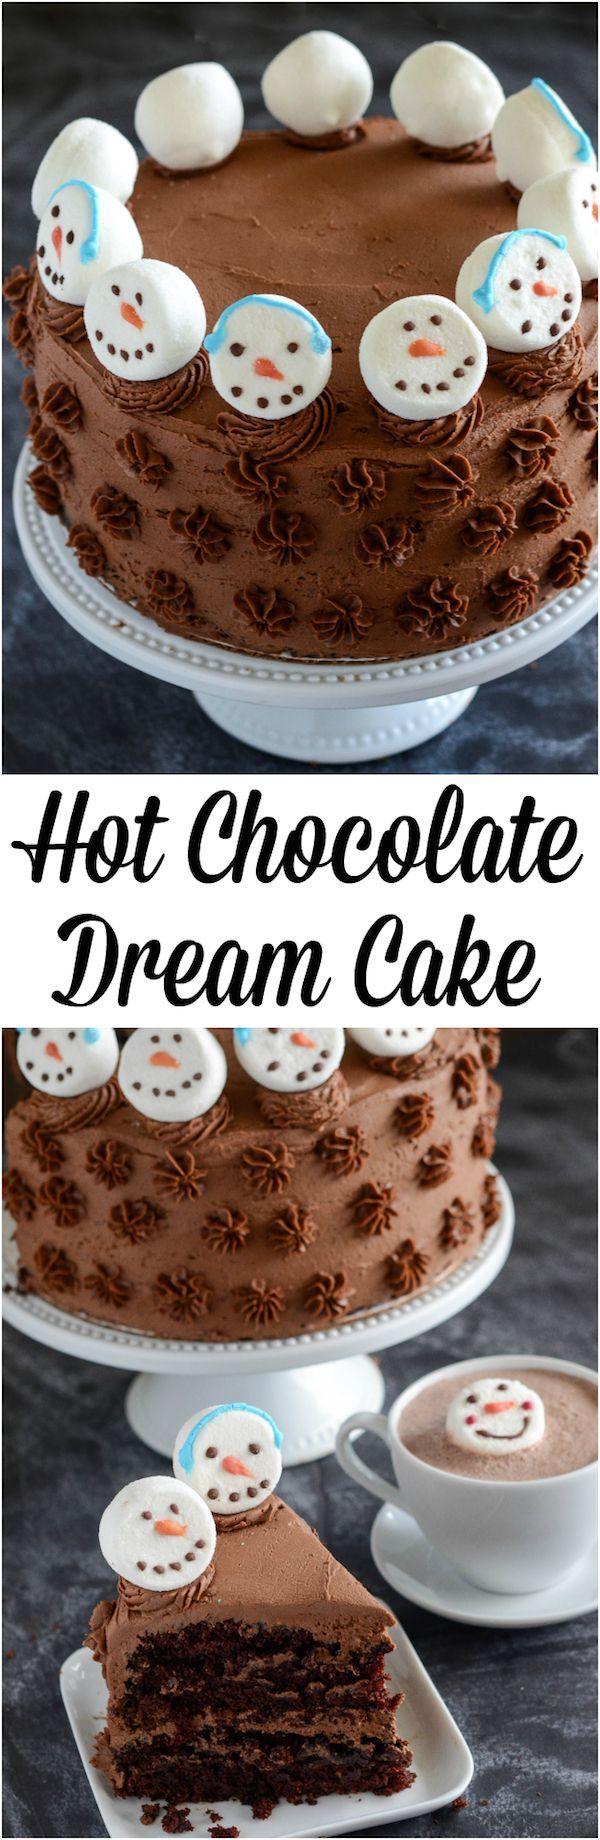 Hot Chocolate Dream Cake You Ve Gotta Make This Cake